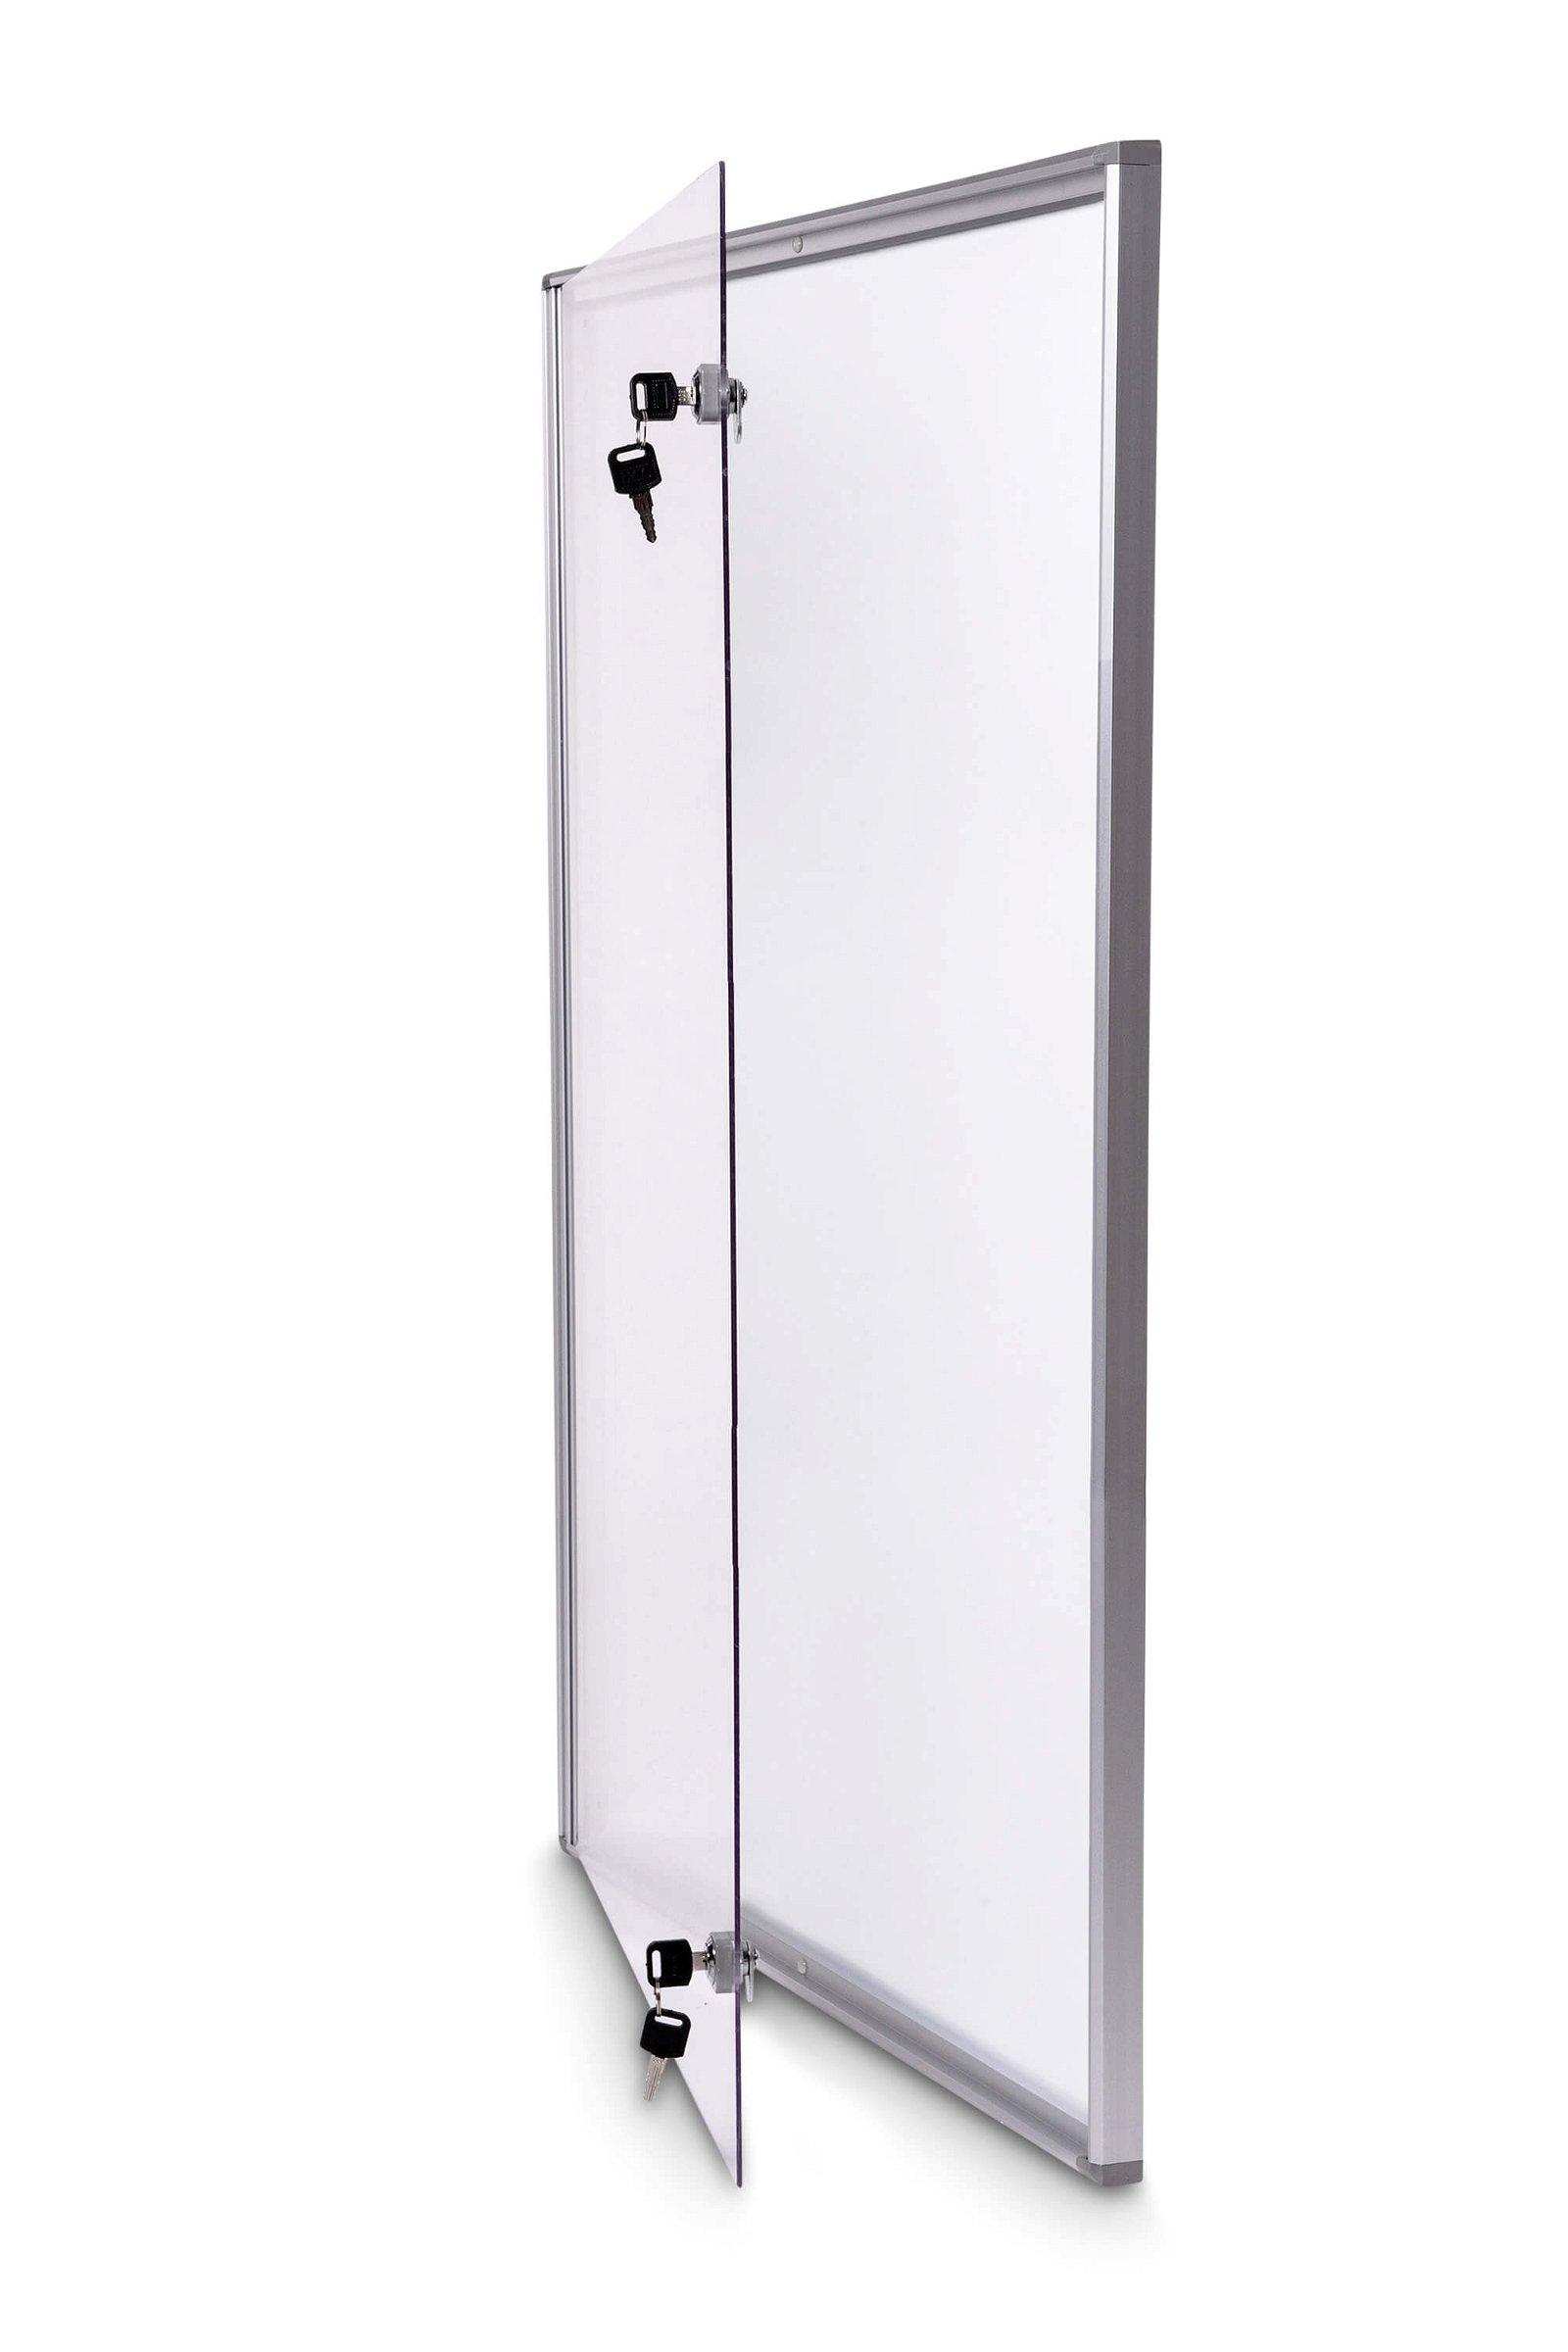 Schaukasten MAULextraslim, 9 x A4, aluminium